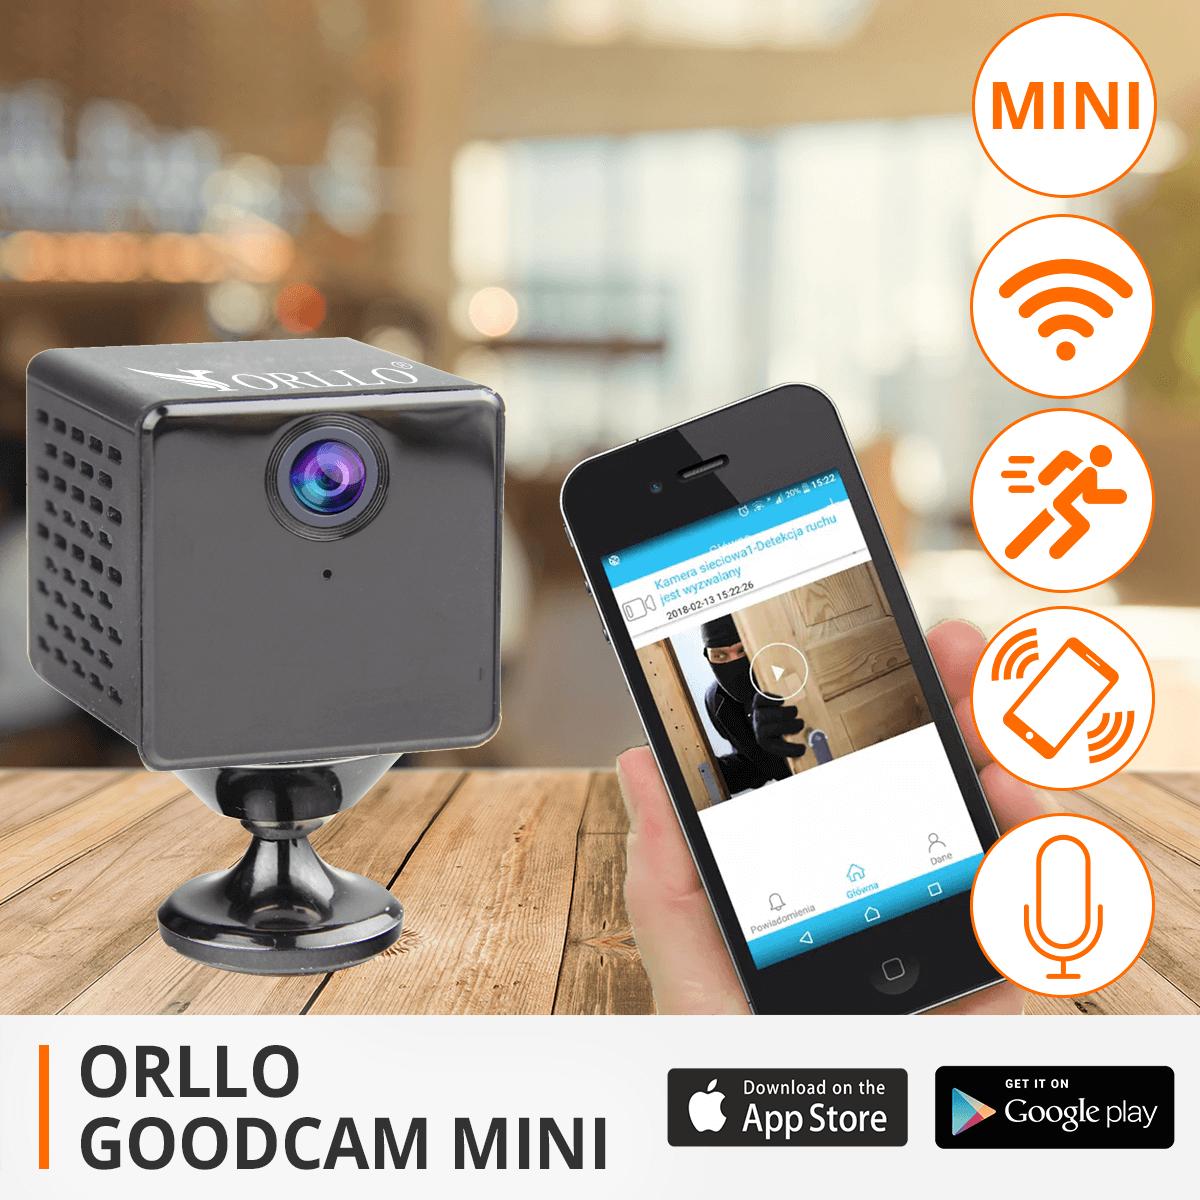 kamera iP wifi bezprzewodowa monitoring orllo.pl